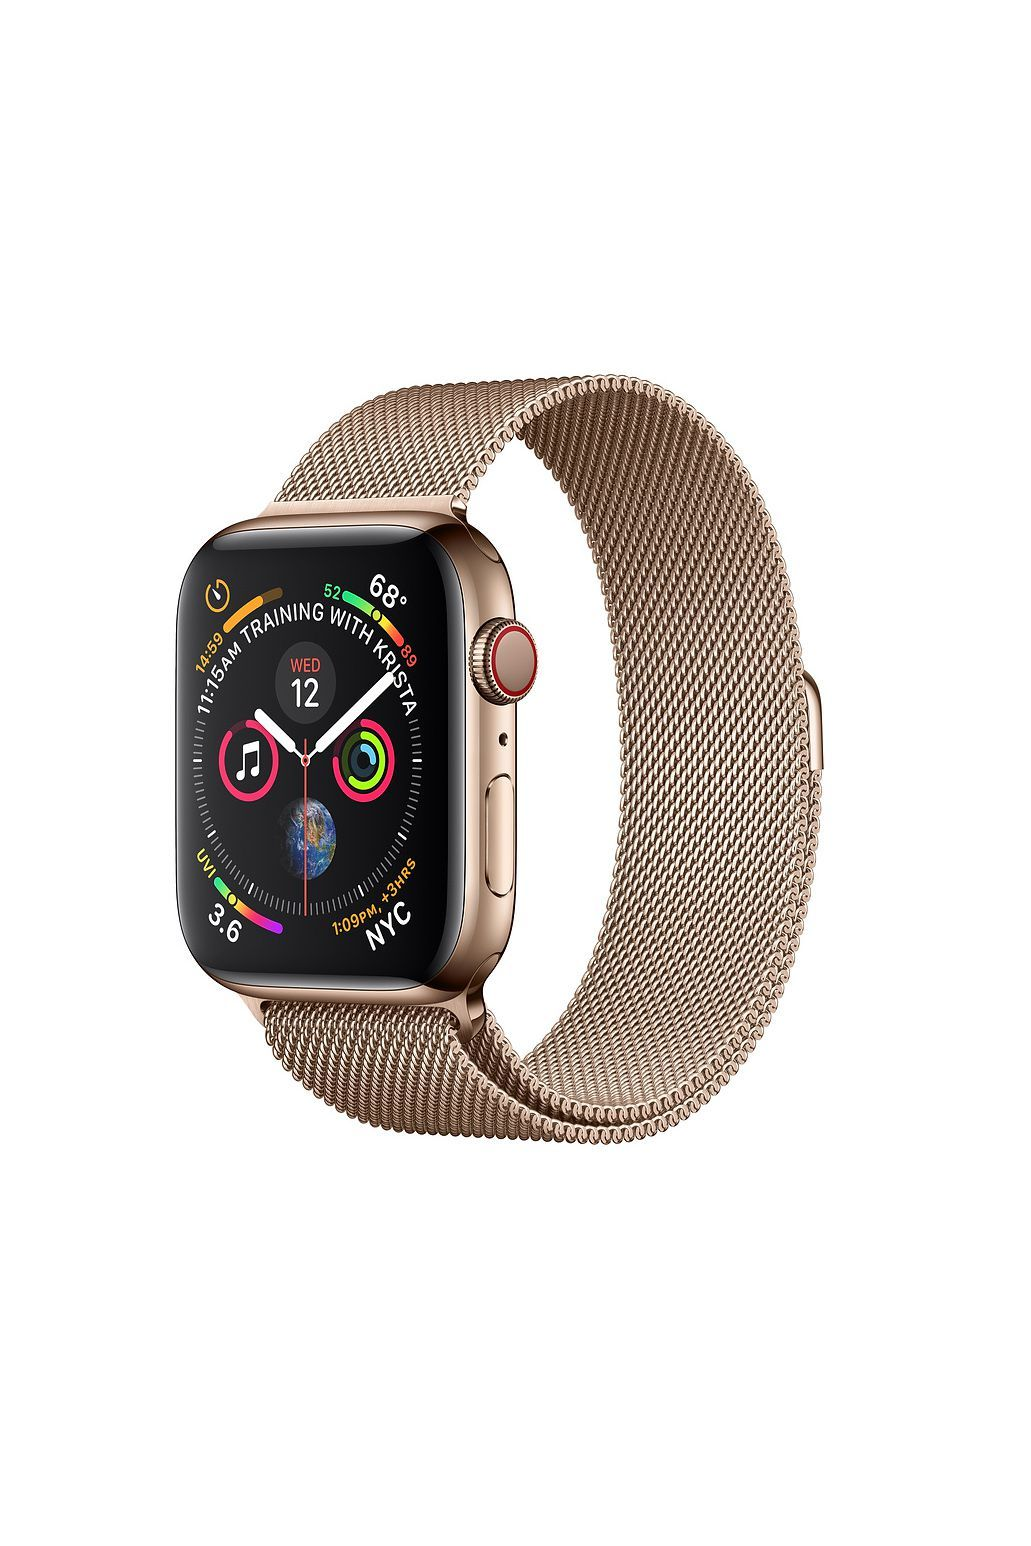 The Latest Apple Watch